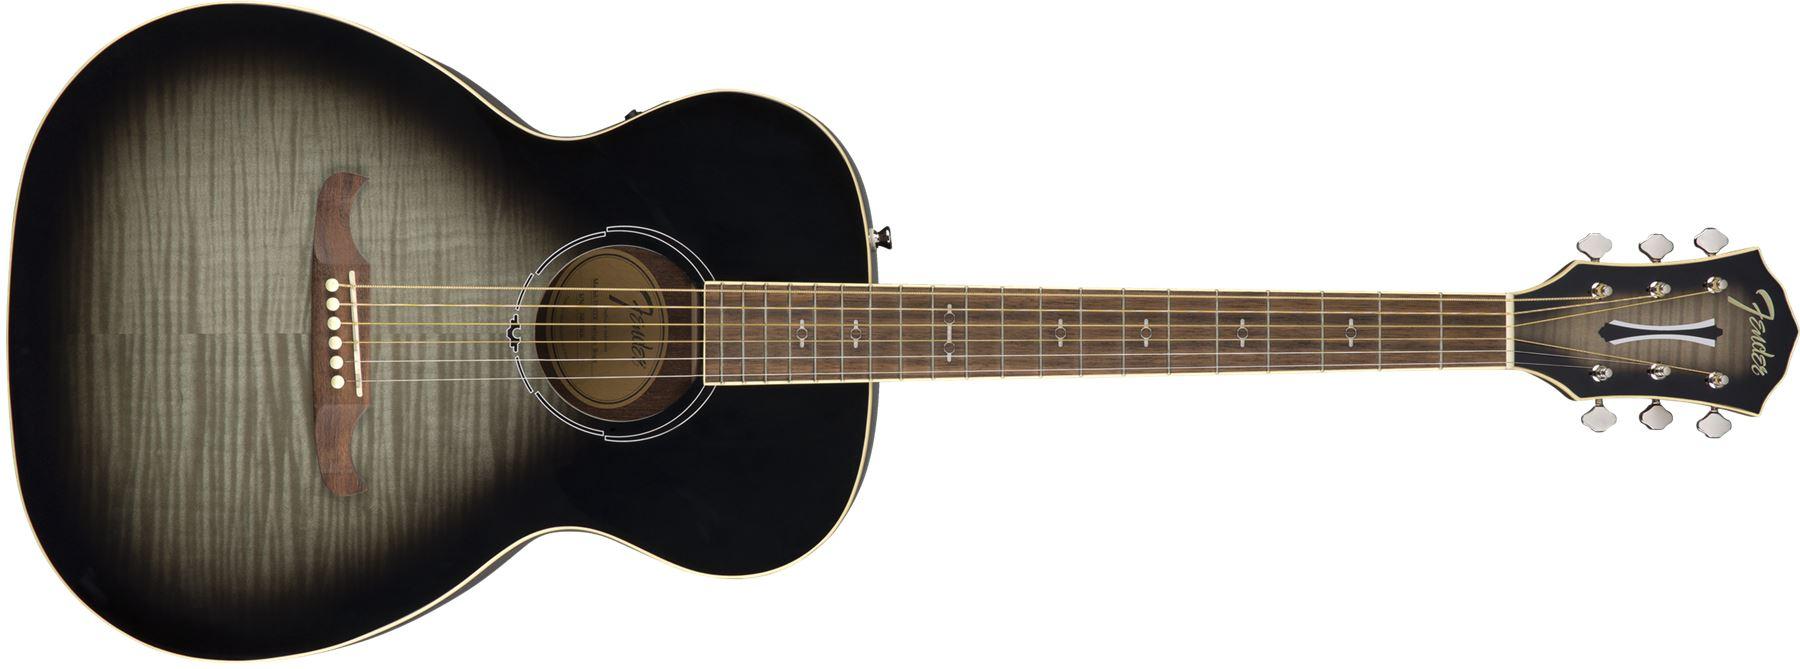 Fender FA-235E Concert, Moonlight Burst